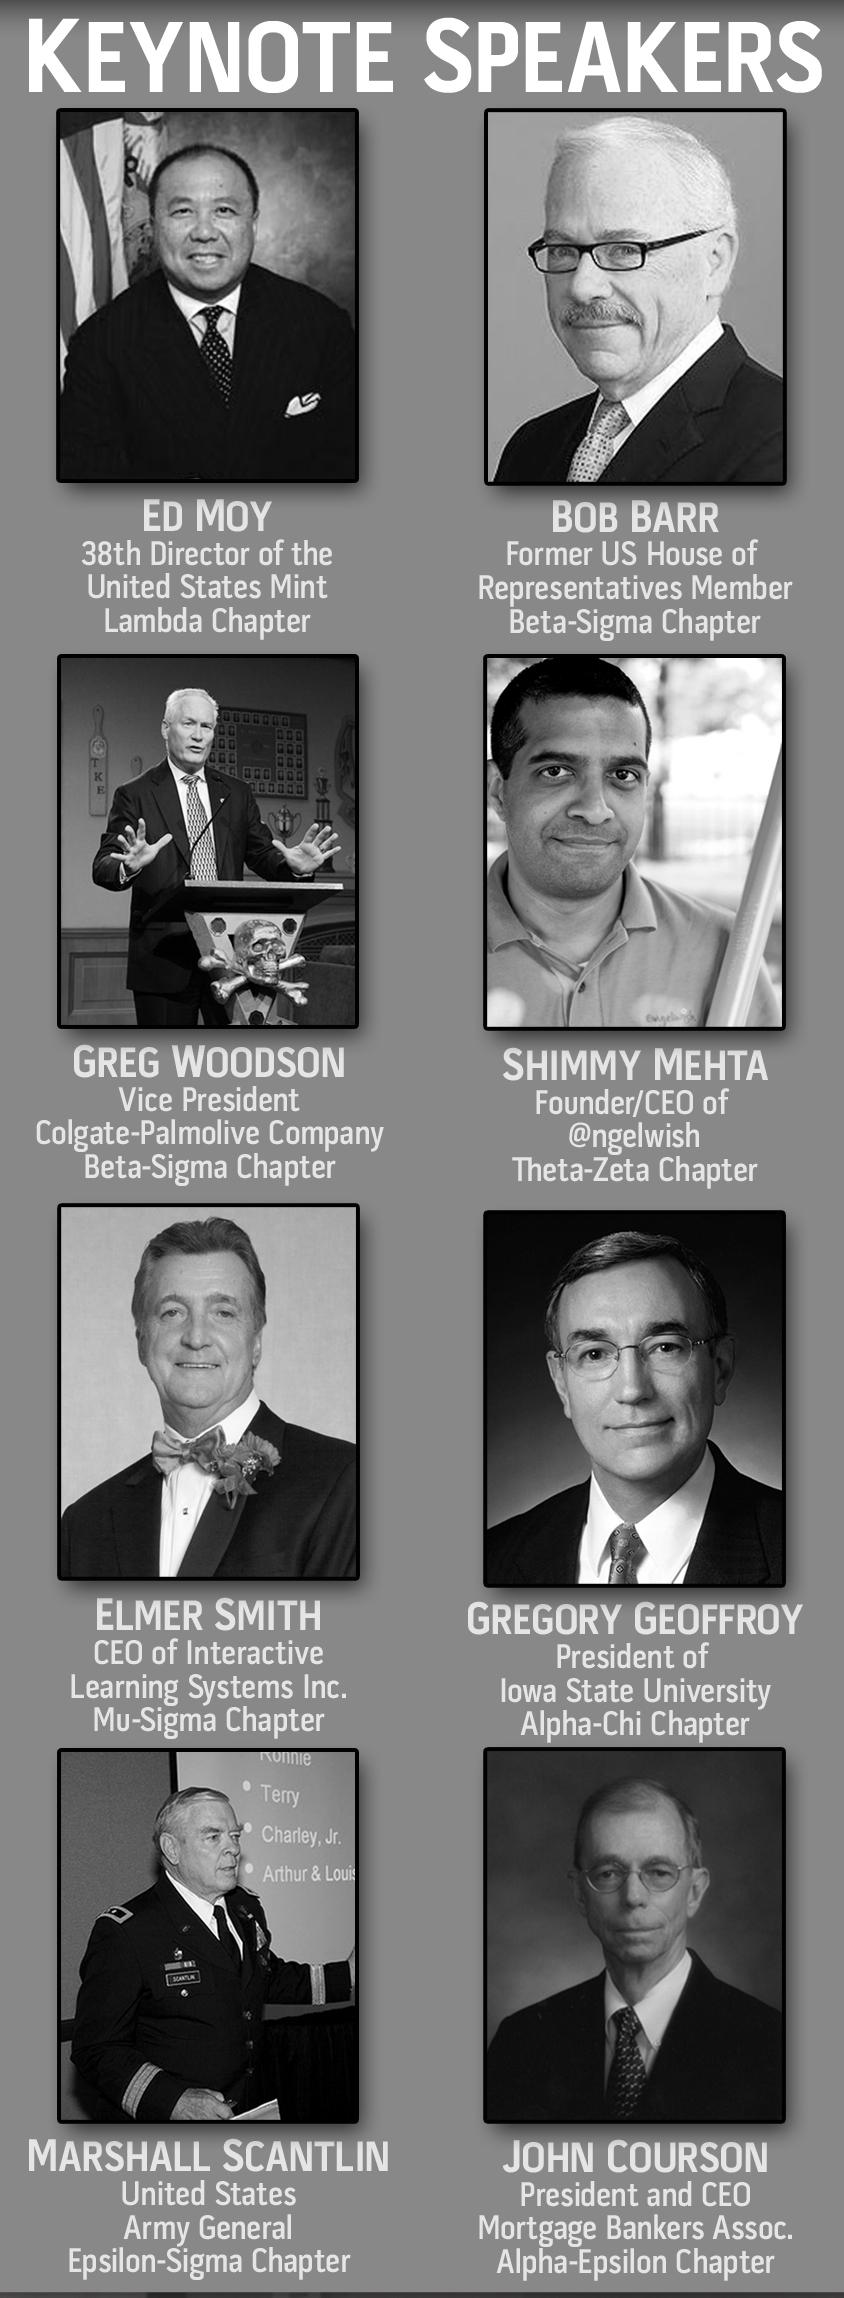 RLC 2012 Speakers